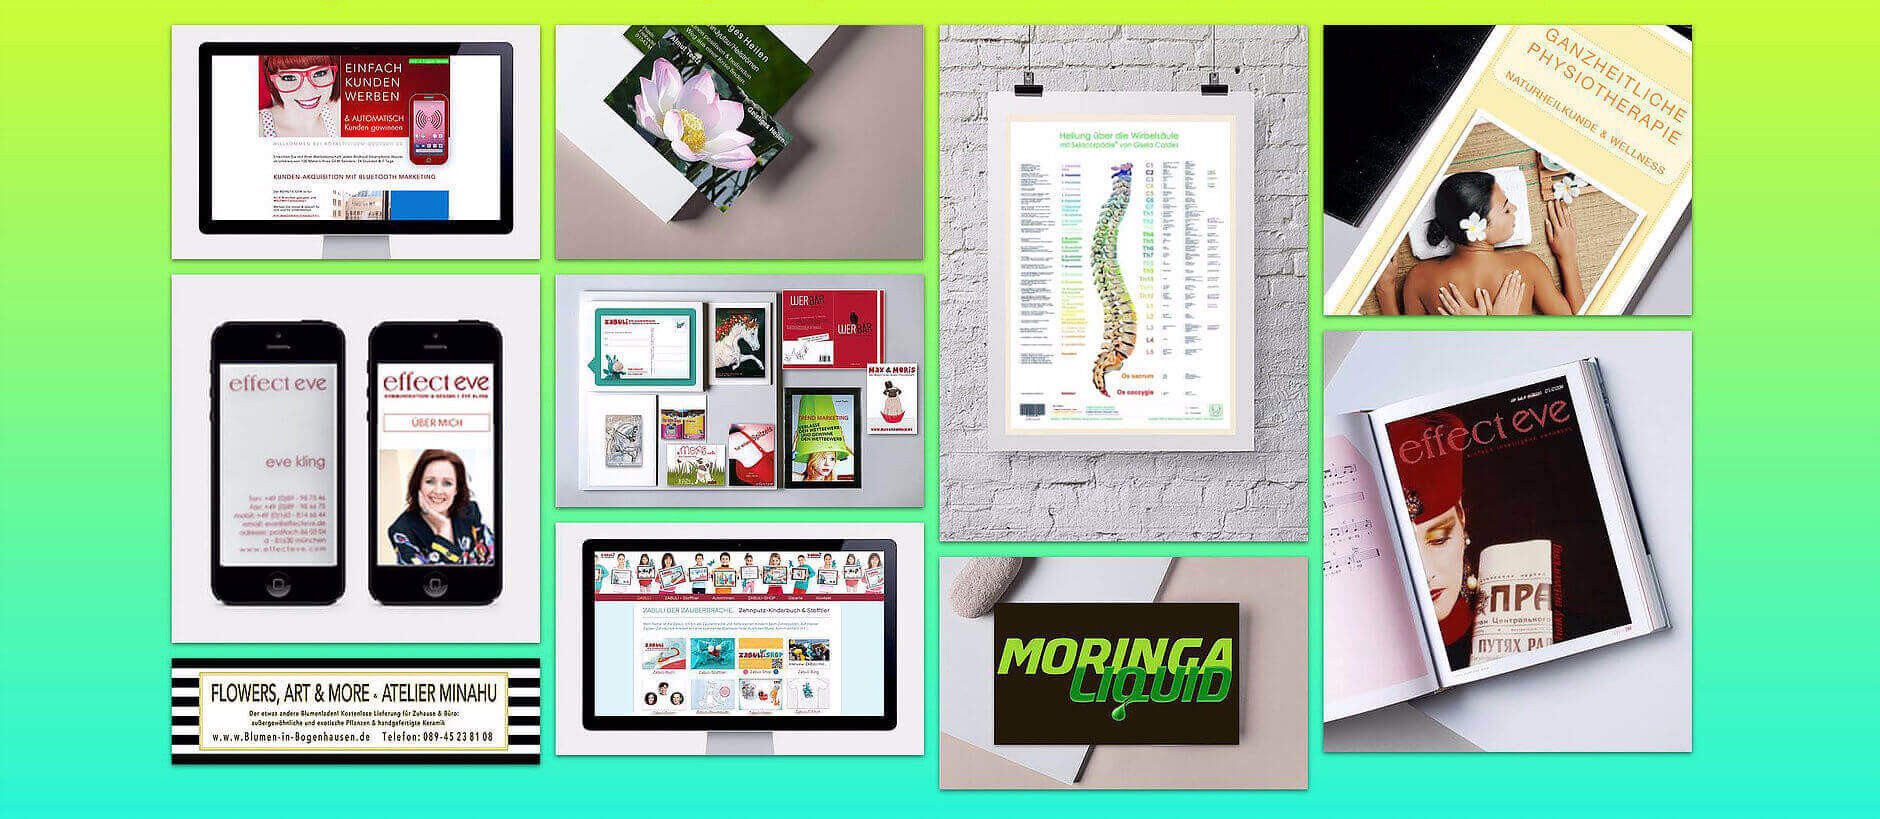 Kommunikations Design Effecteve Online Marketing München